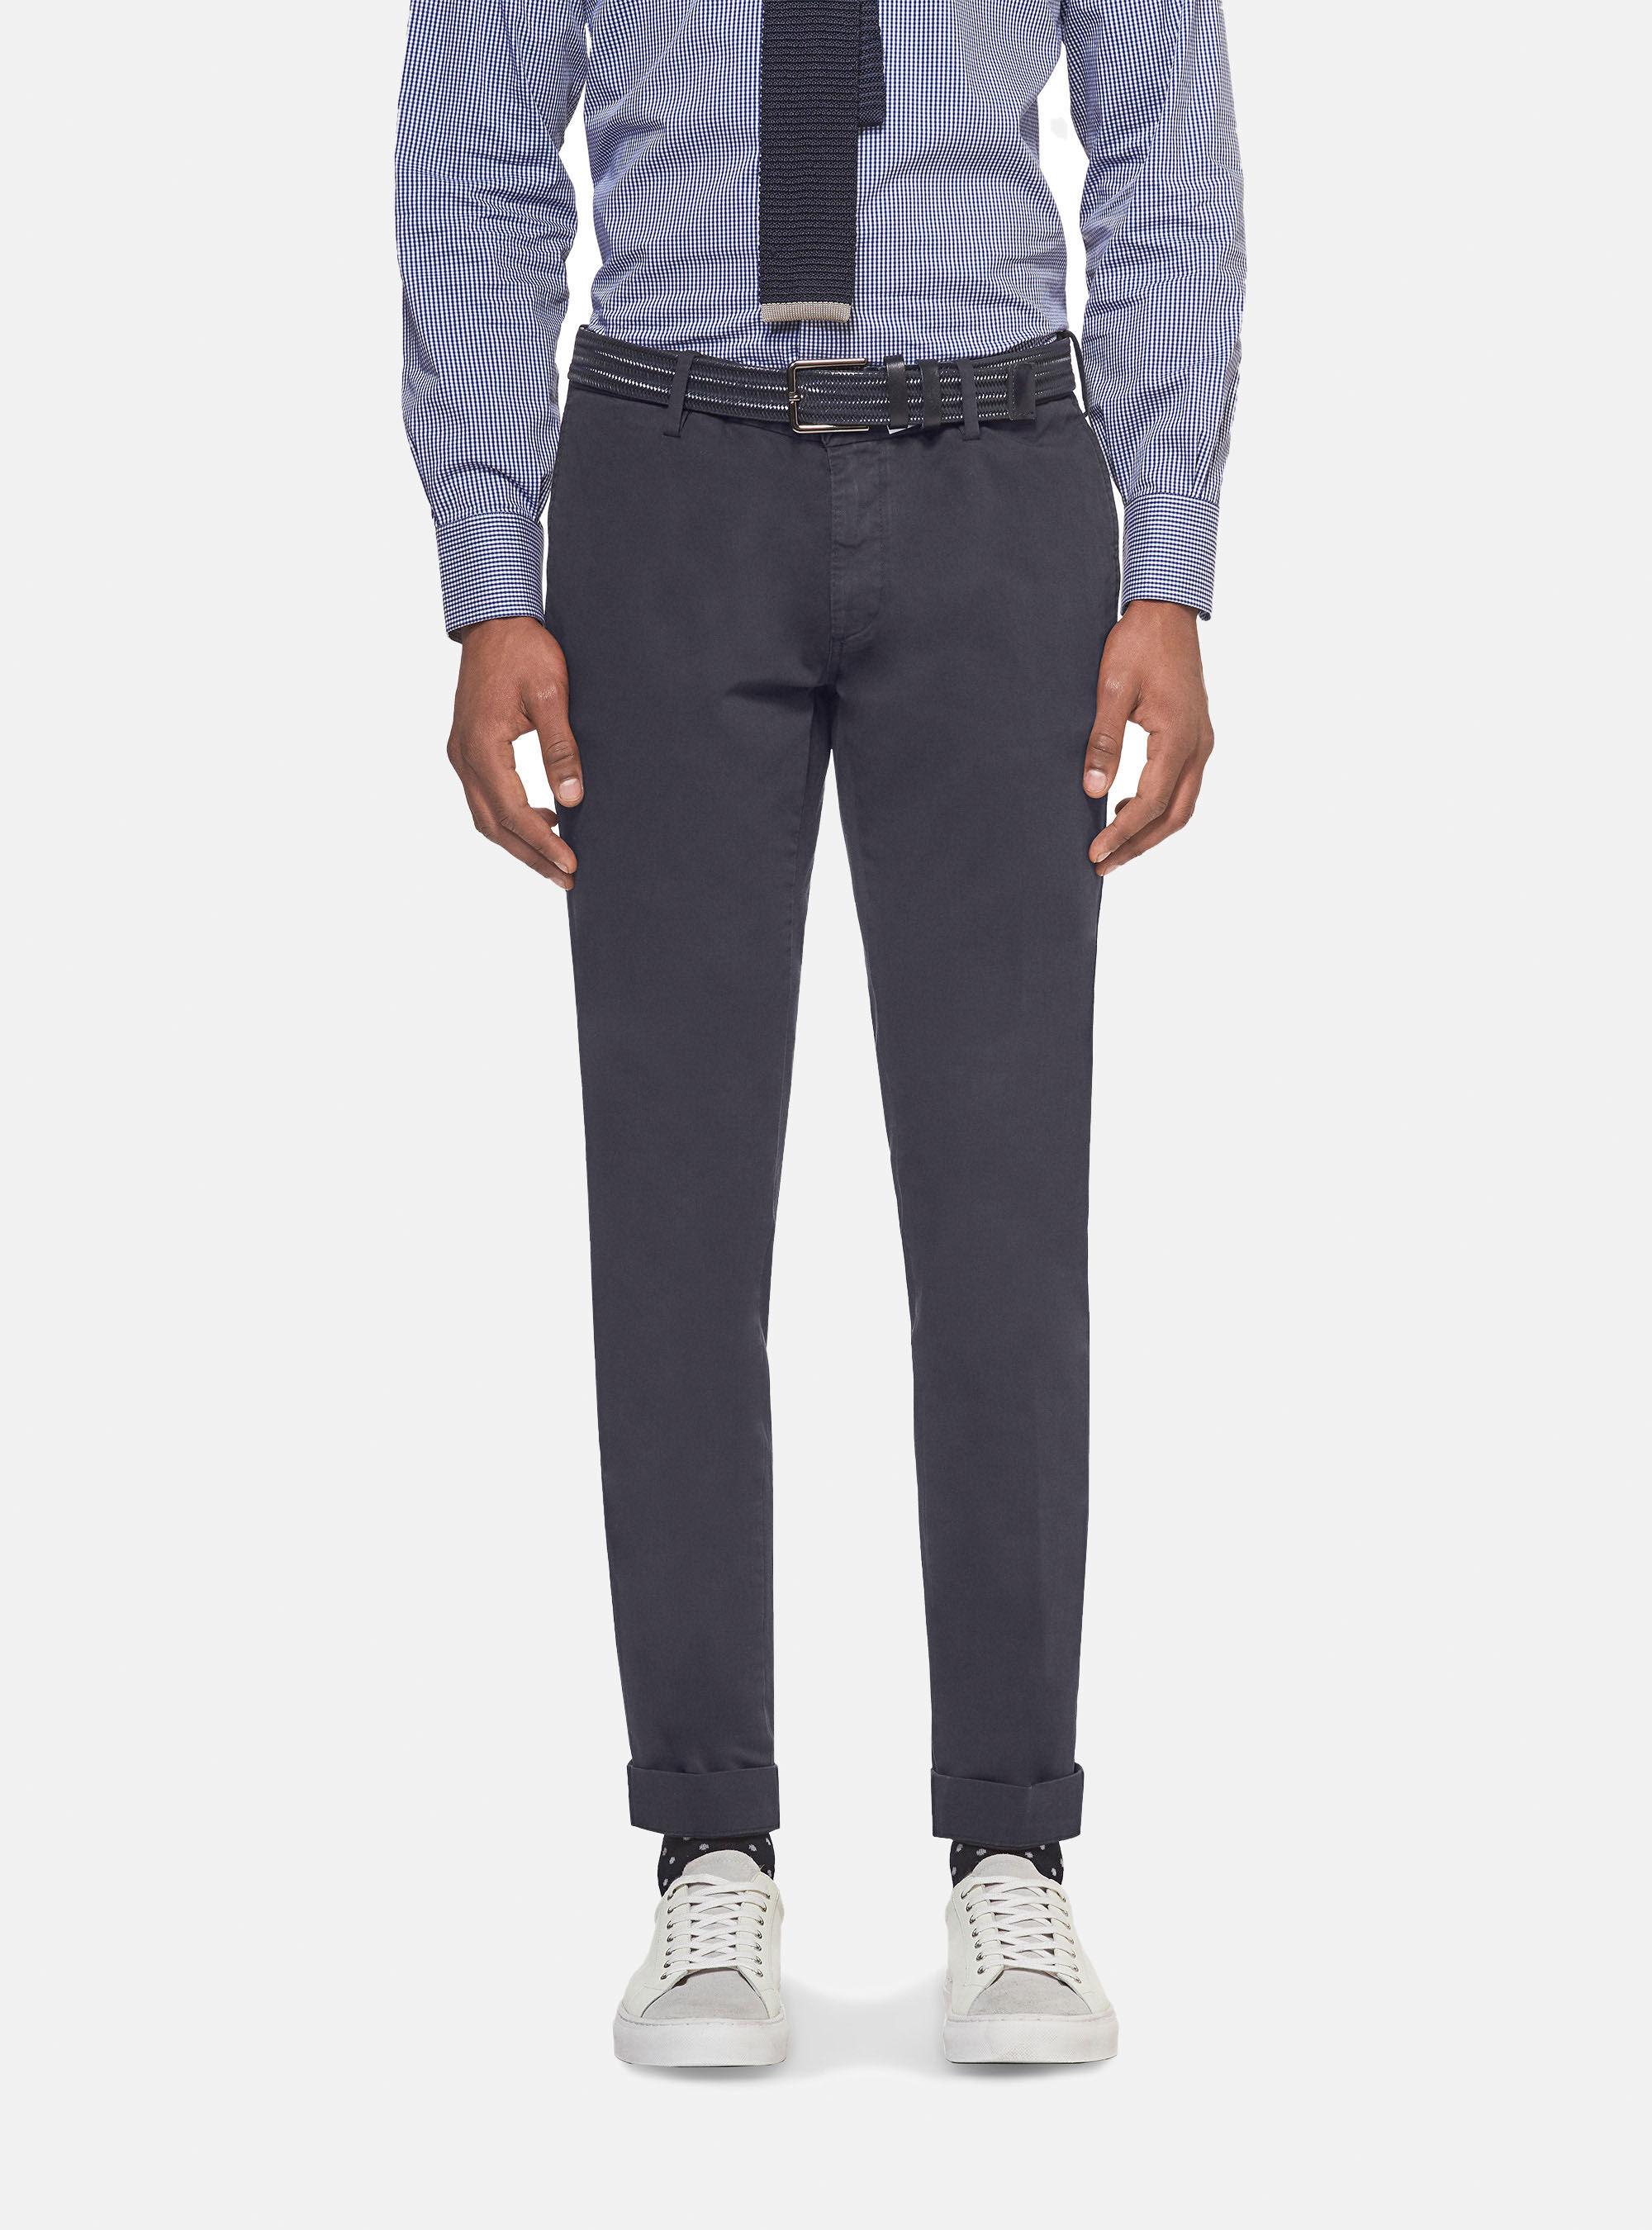 Pantaloni Uomo Regular Fit a Jeans da uomo   Acquisti Online